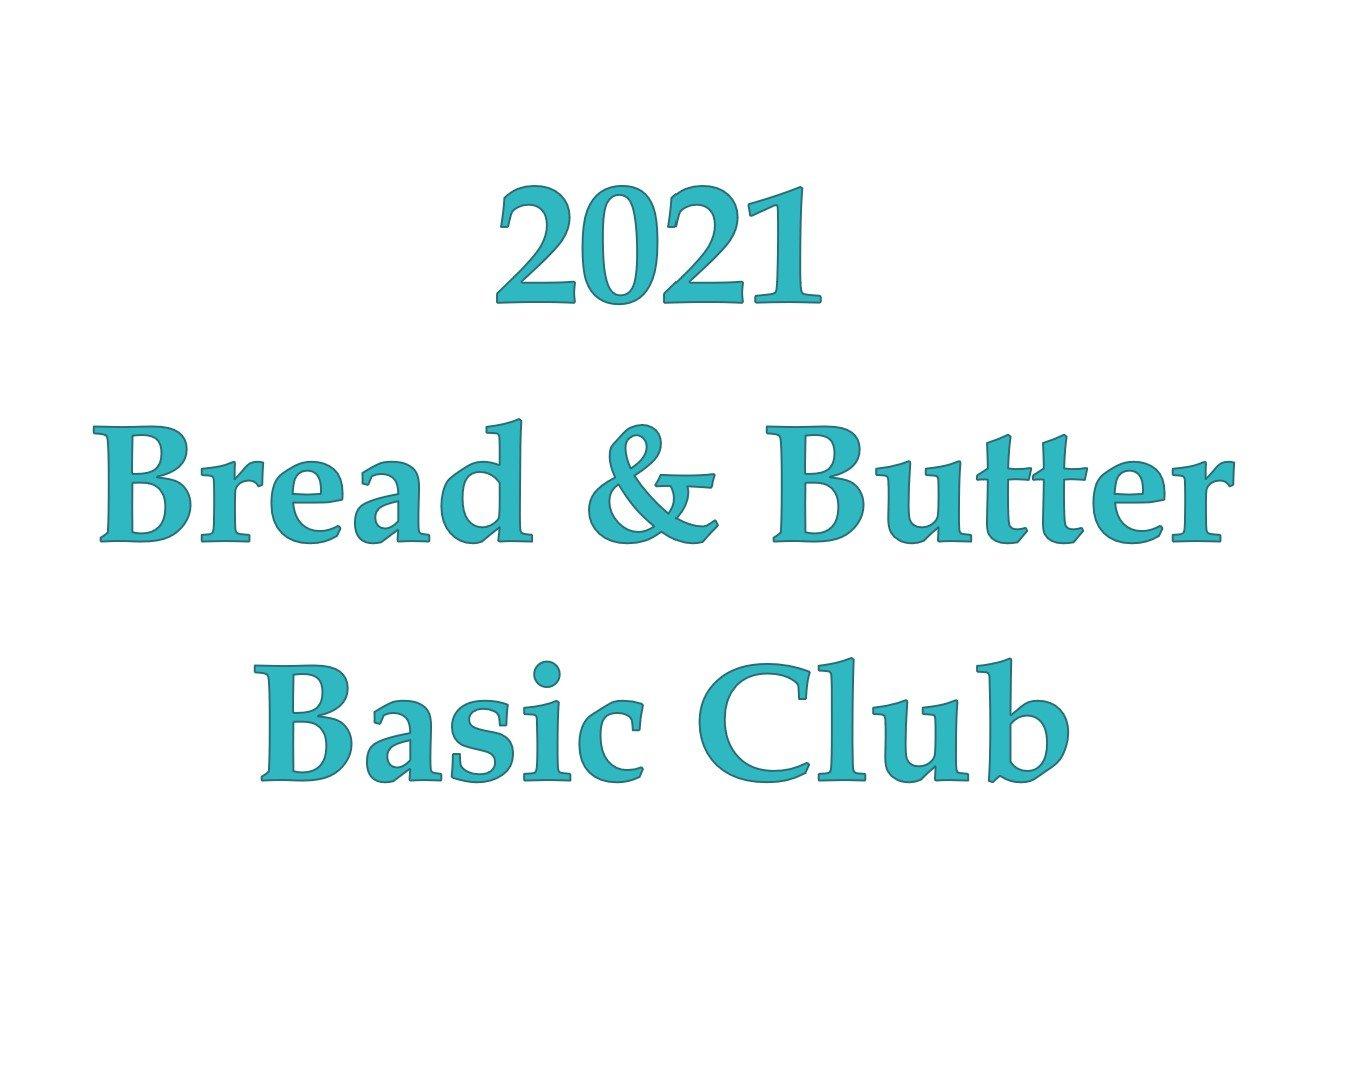 2021 Bread & Butter Basic Club